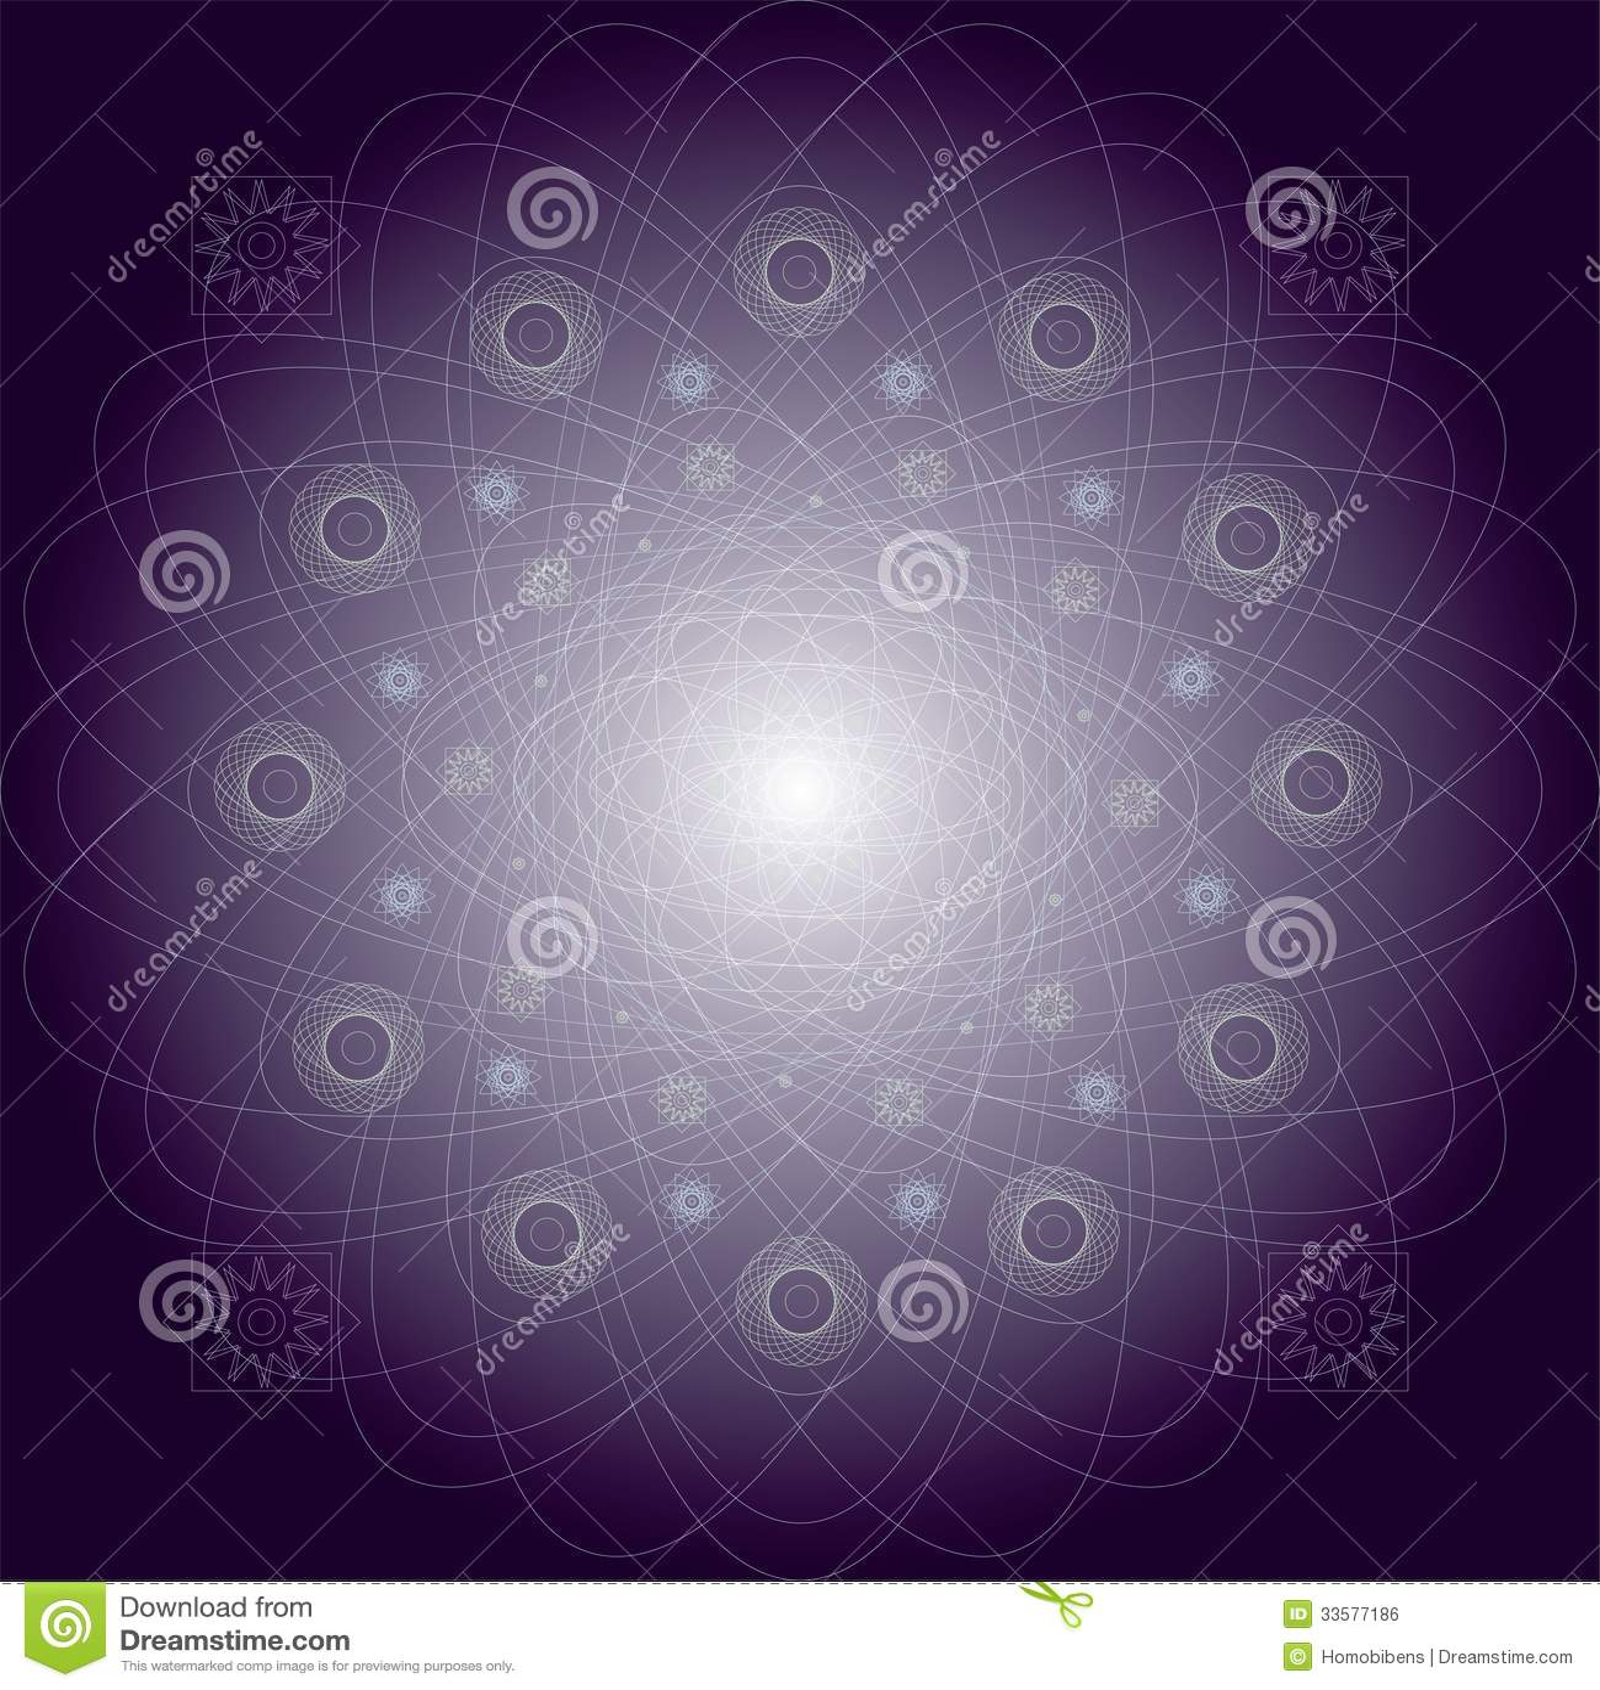 Illustration purple mystical pattern